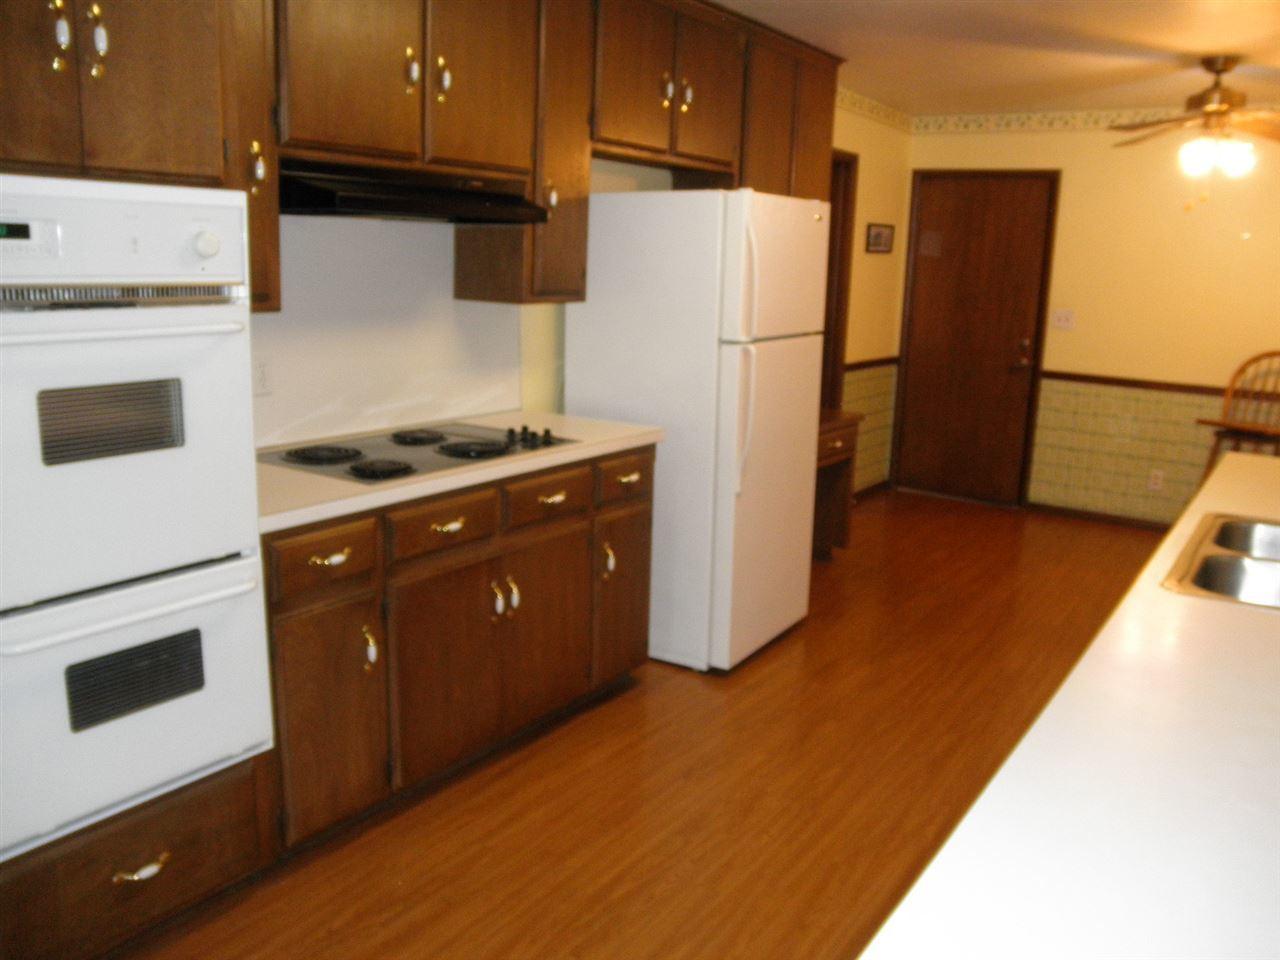 Sold Intraoffice W/MLS | 1404 Meadowbrook Ponca City, OK 74604 9